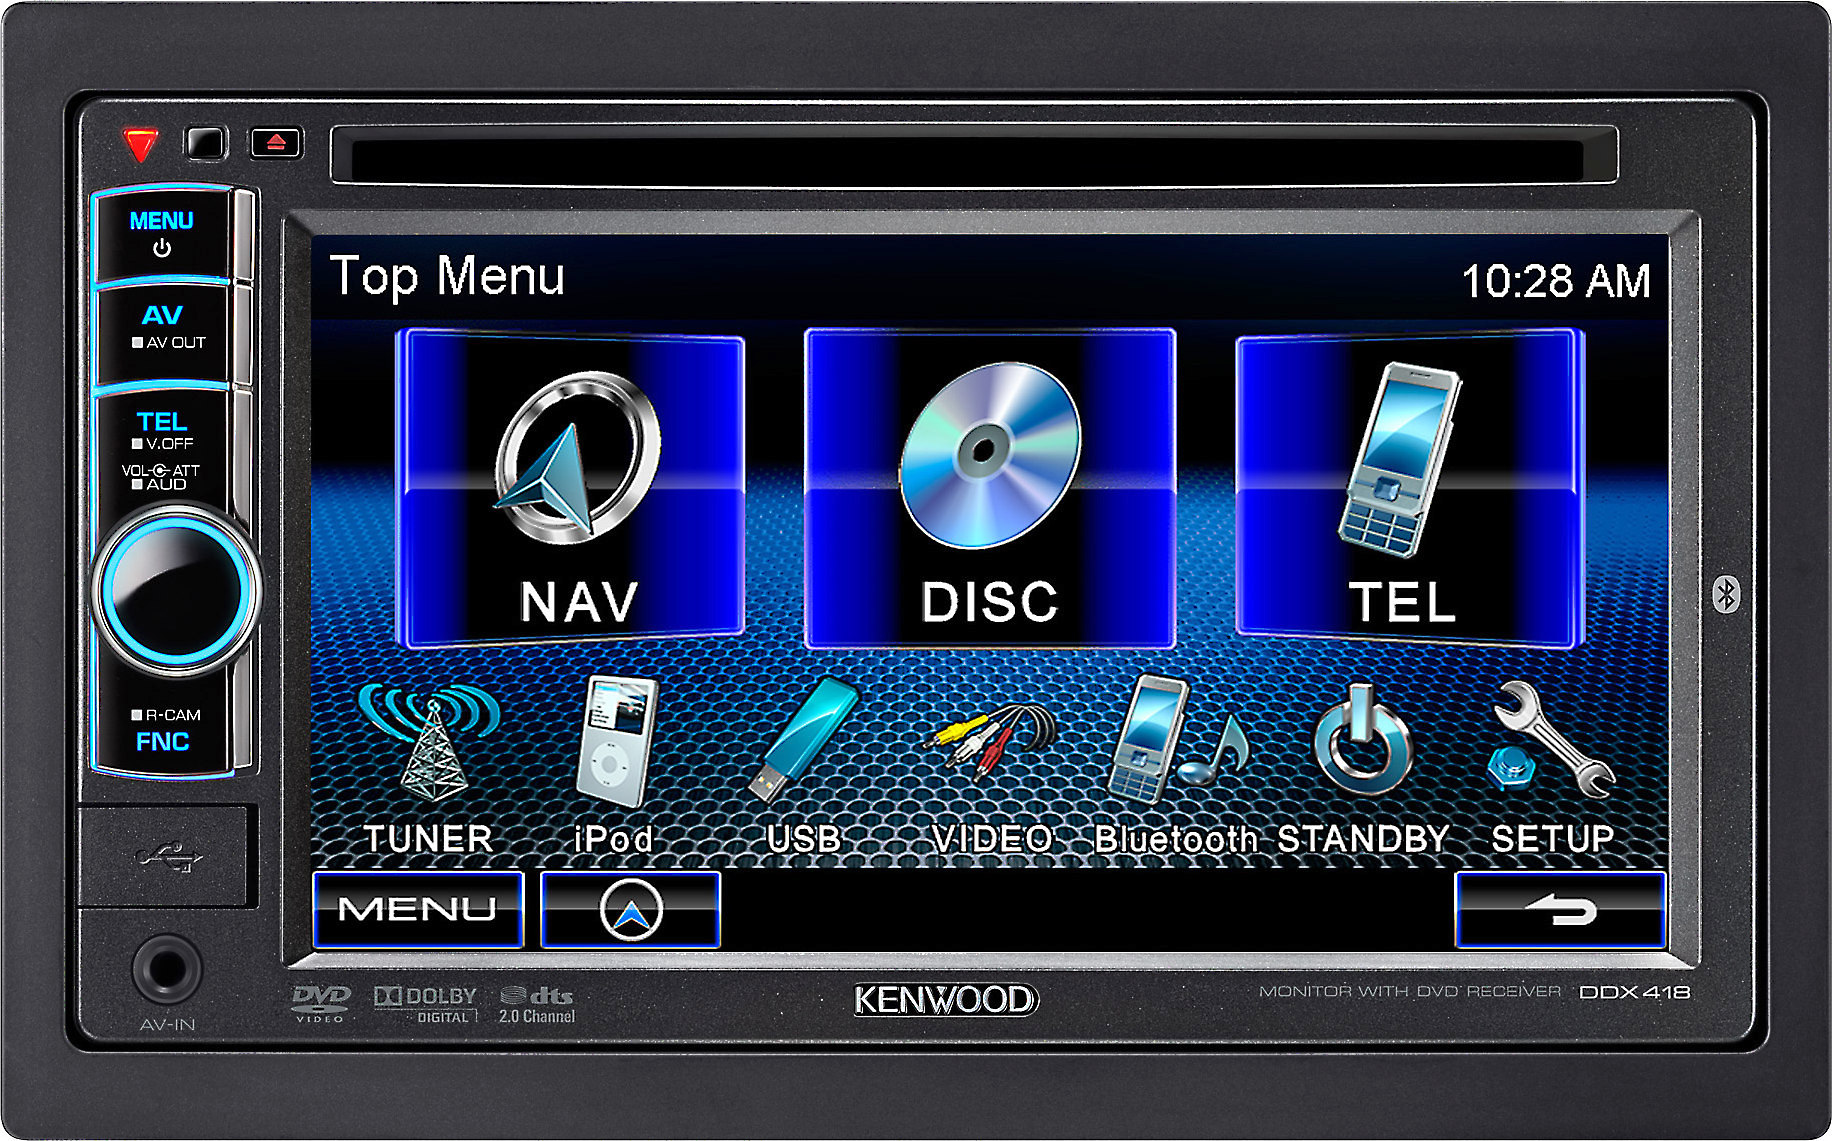 hight resolution of kenwood ddx418 dvd receiver at crutchfieldkenwood ddx418 wiring harness diagram 13